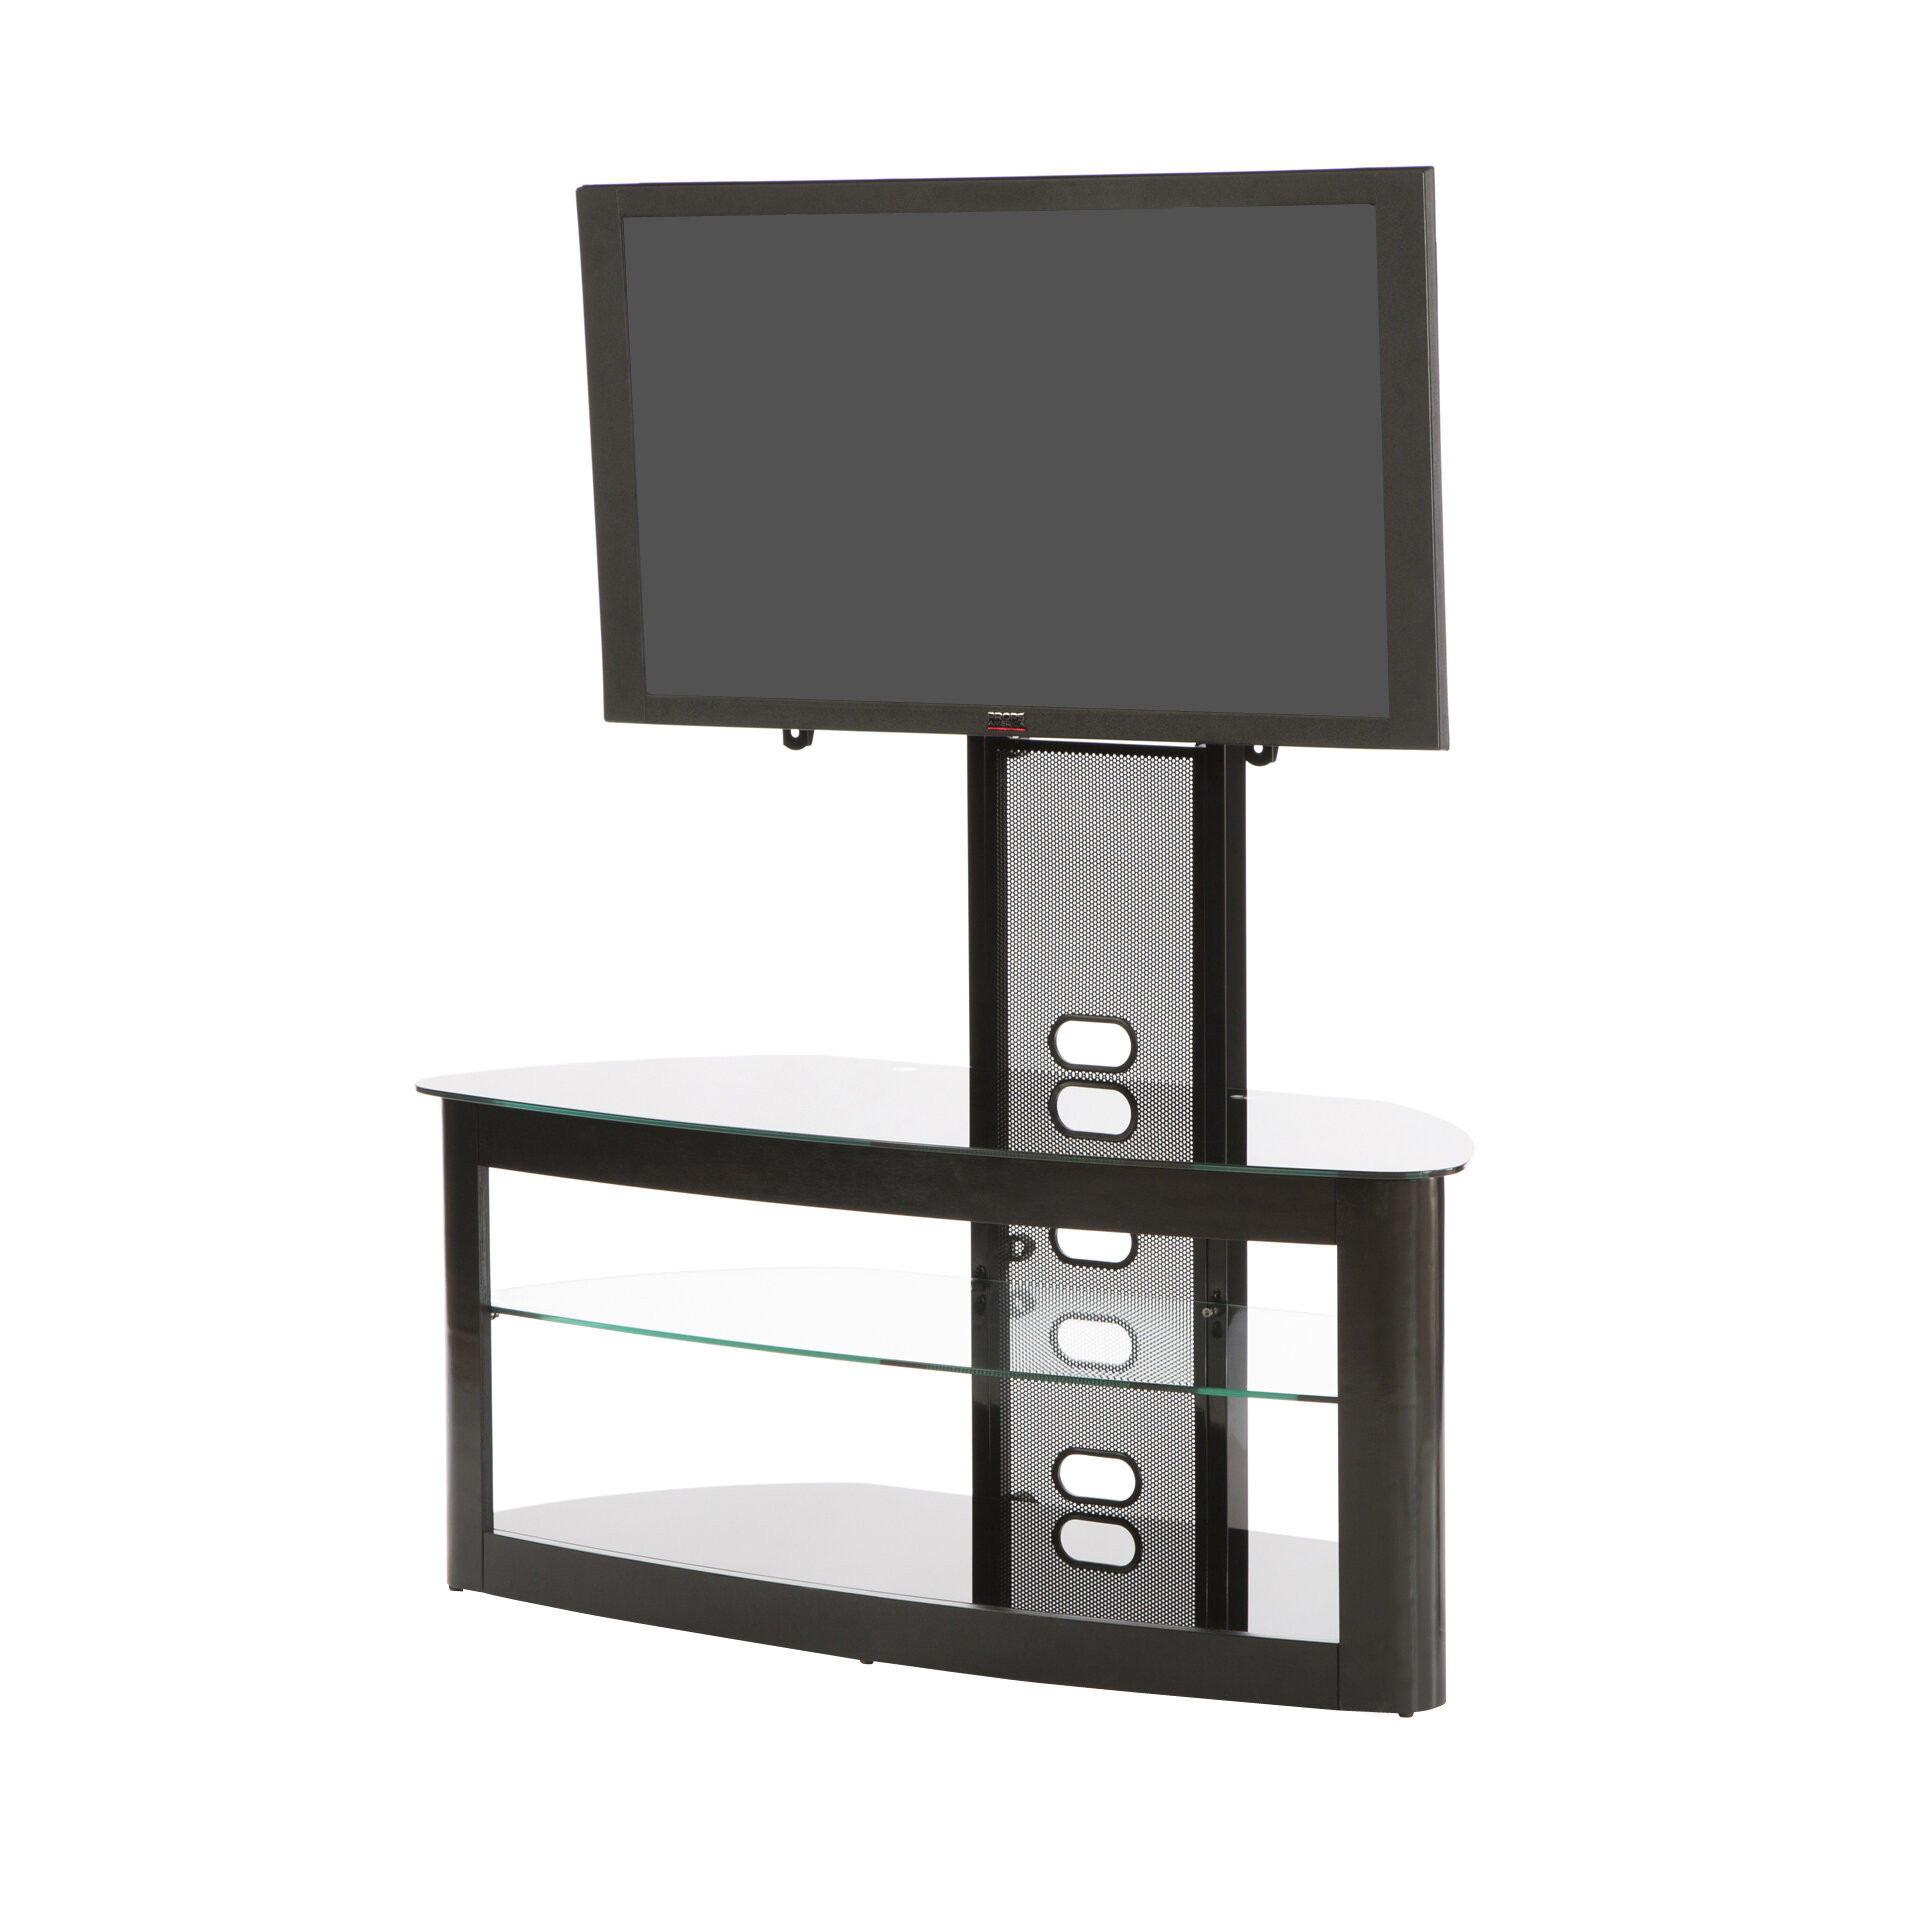 Flat Tv Stand Designs : Hokku designs quot flat panel tv stand ebay